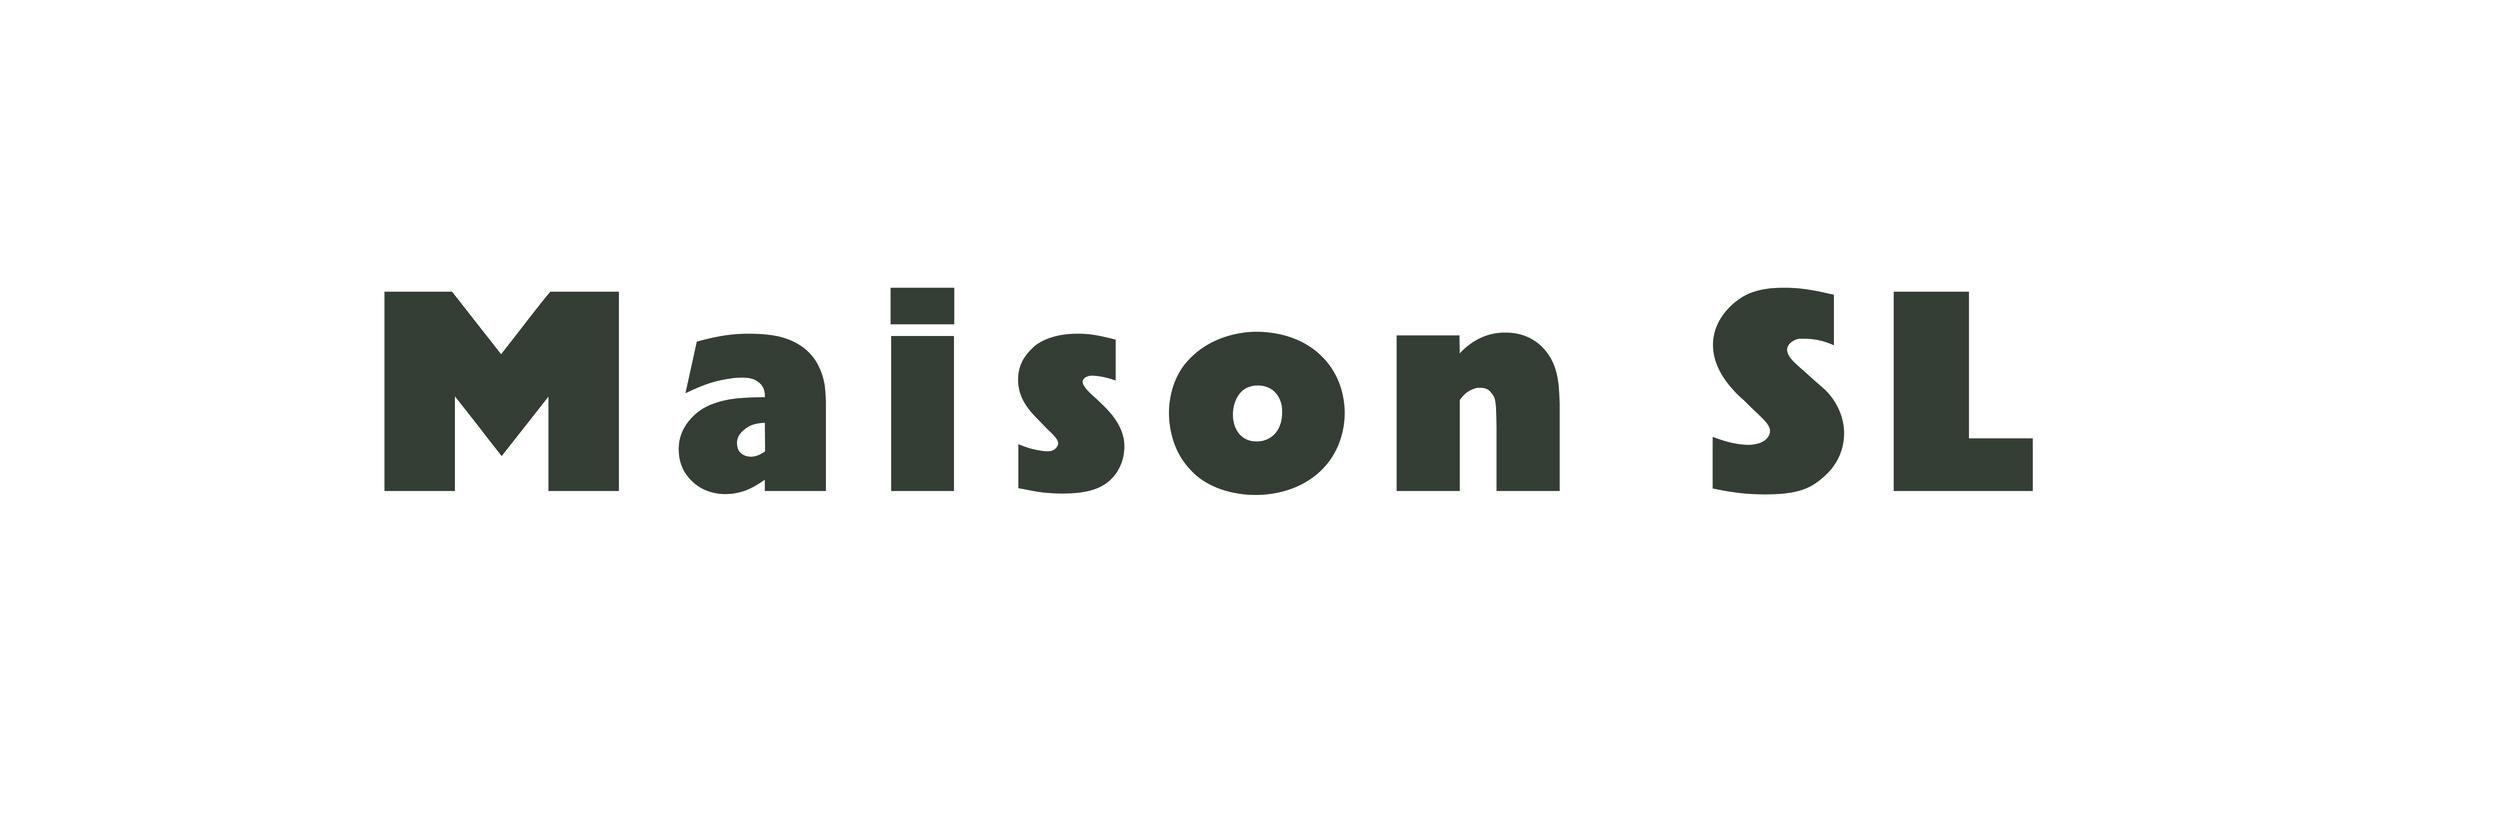 Maison SL Pantone Black 7C (C0 M0 Y11.5 K87) on White.jpg